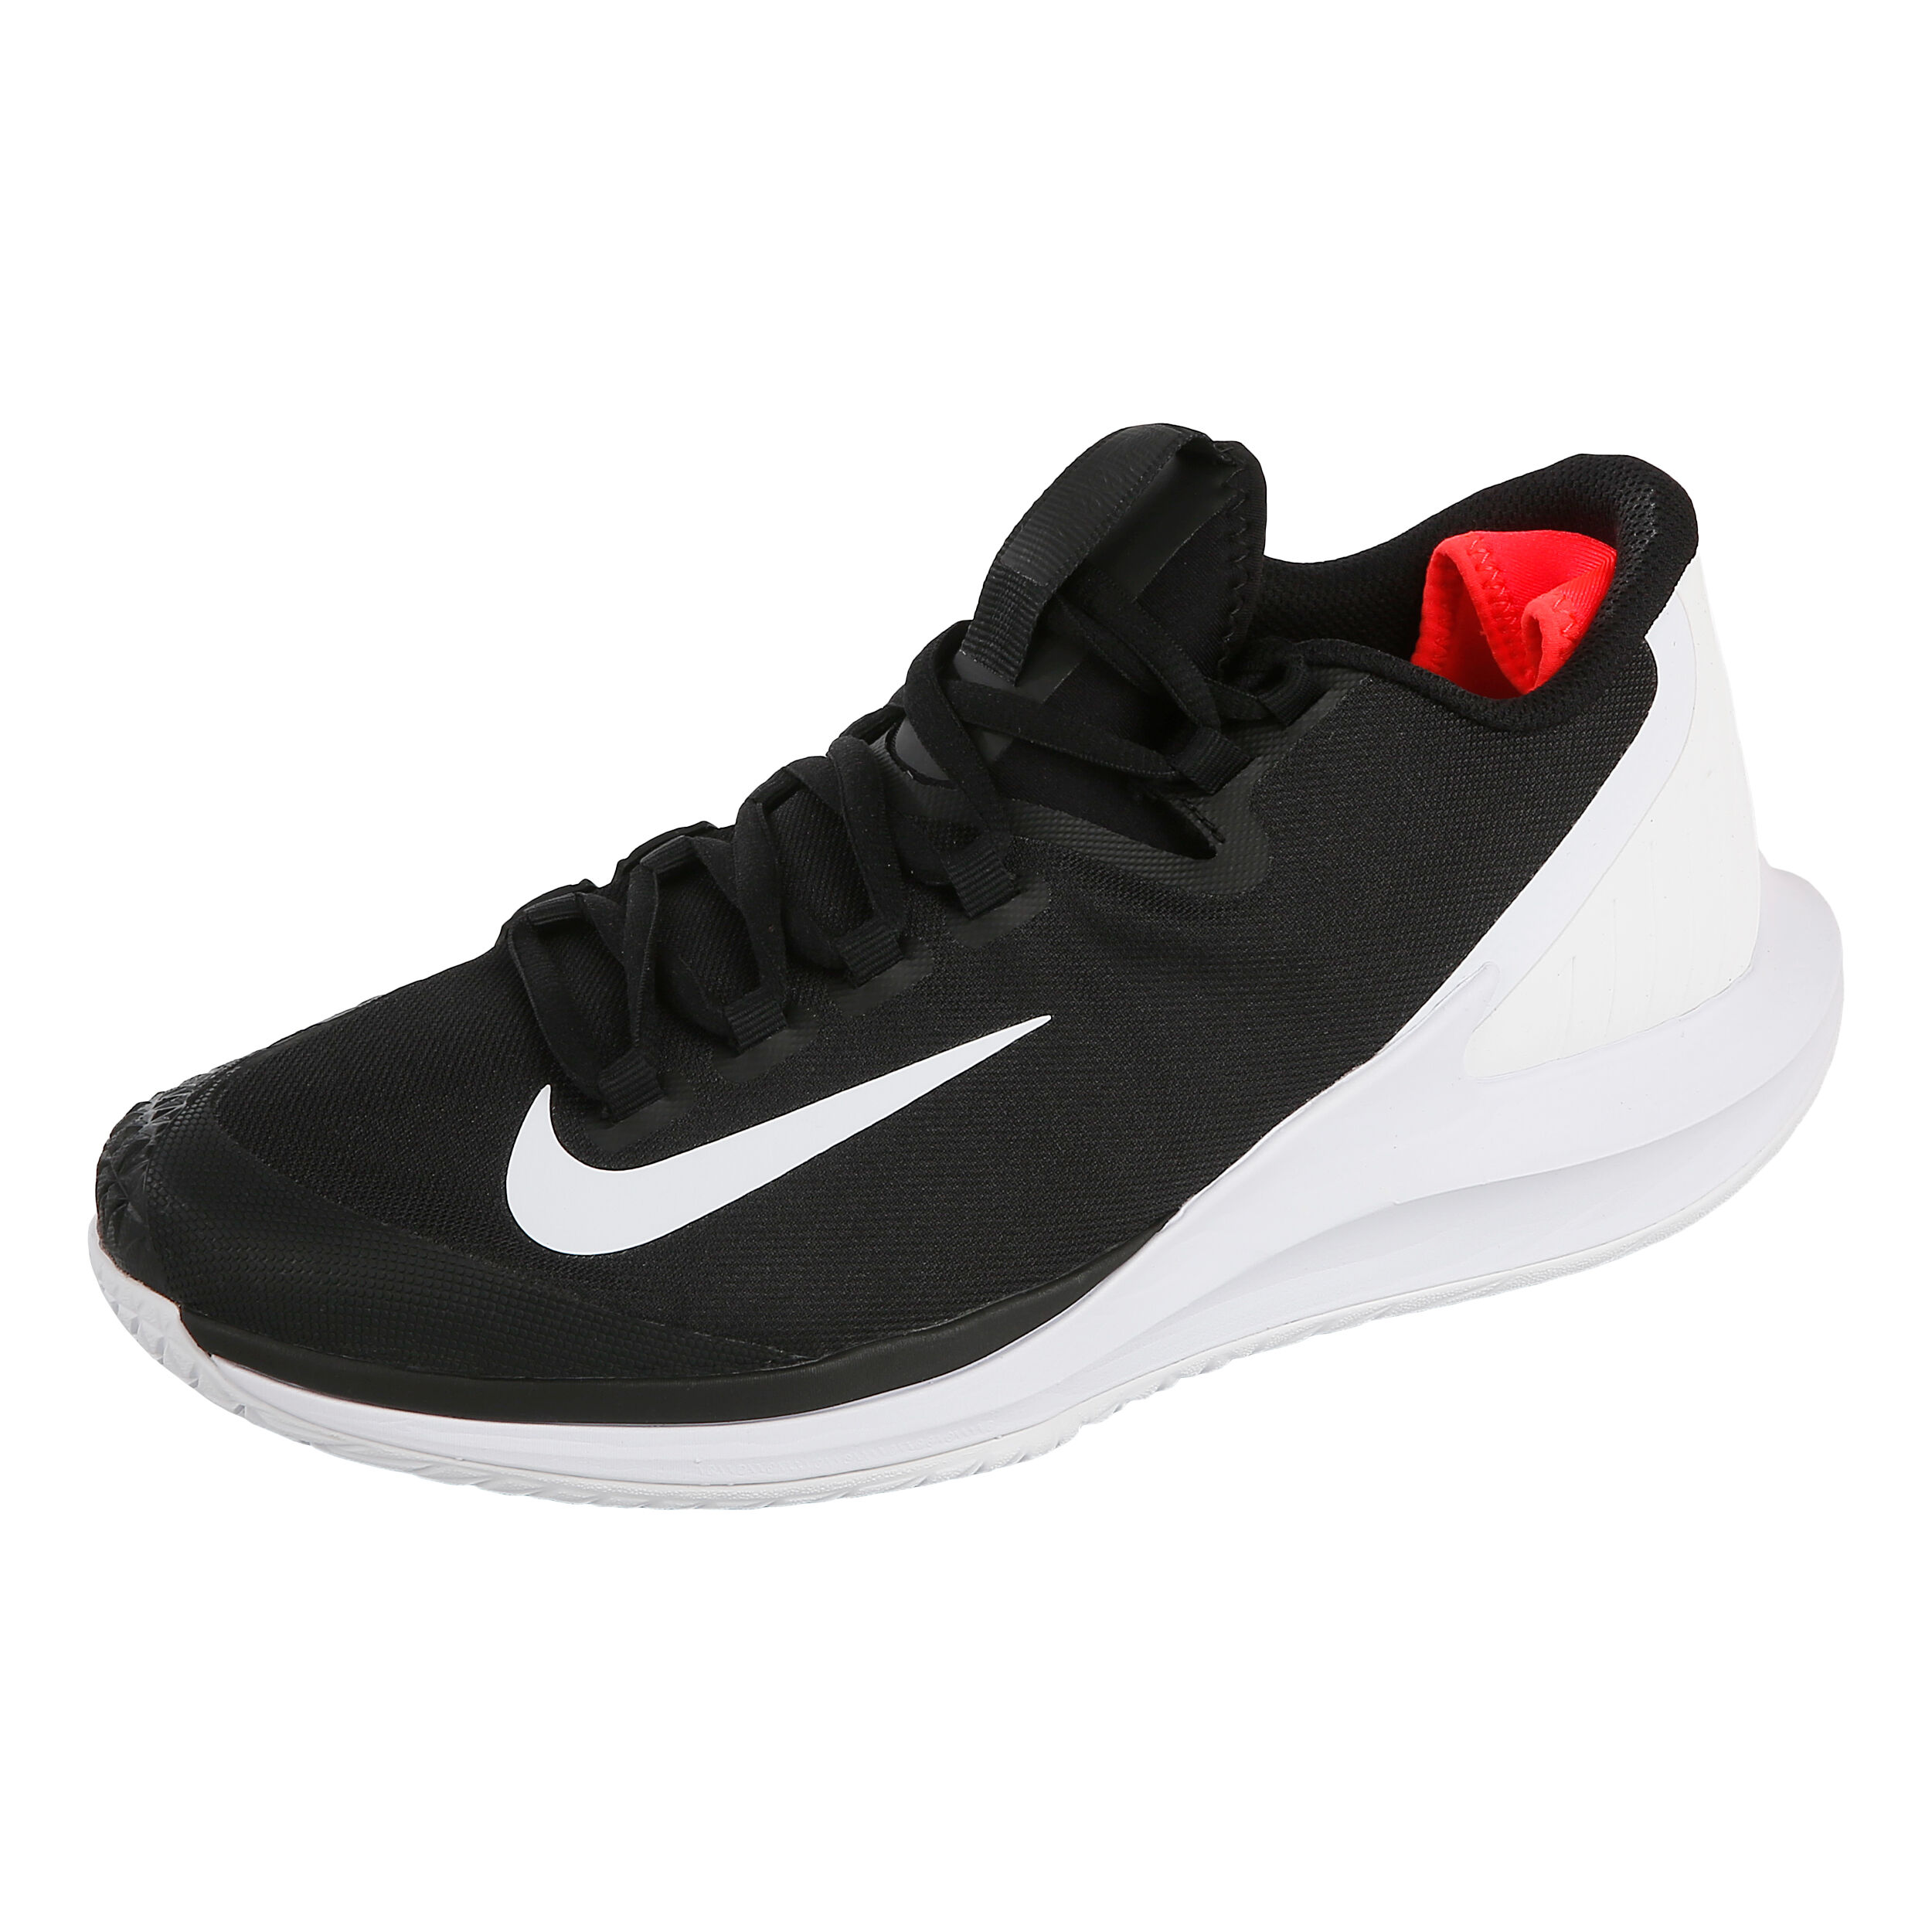 Zoom Chaussure Tout NoirBlanc Zero Hc Terrain Hommes Nike Air uTc315JKlF